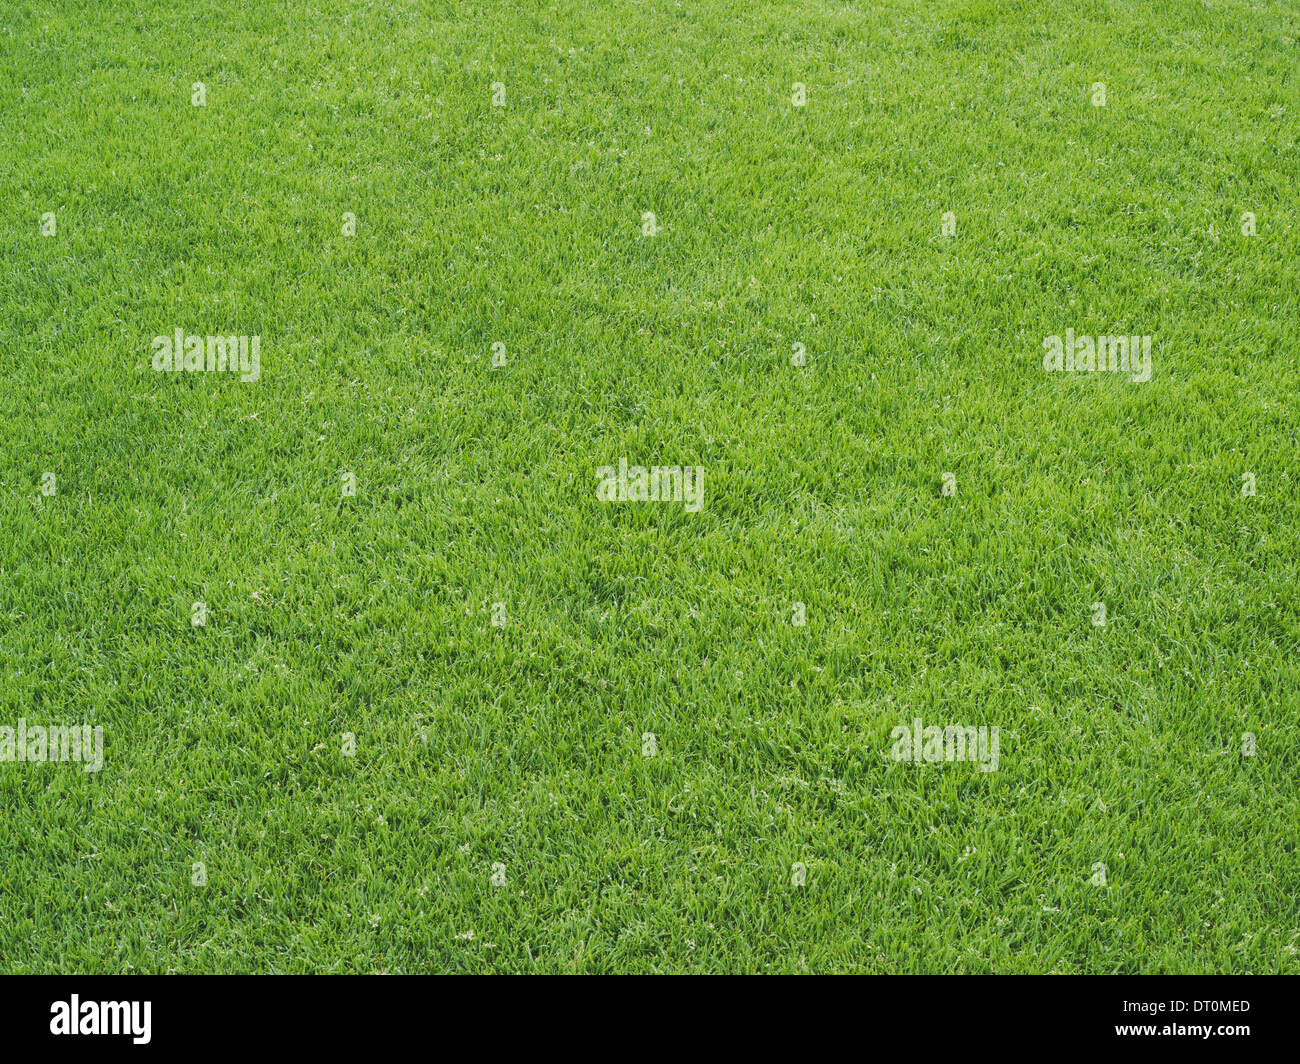 Washington USA grüne Rasenfläche auf einem Leichtathletik-Sportplatz Stockbild